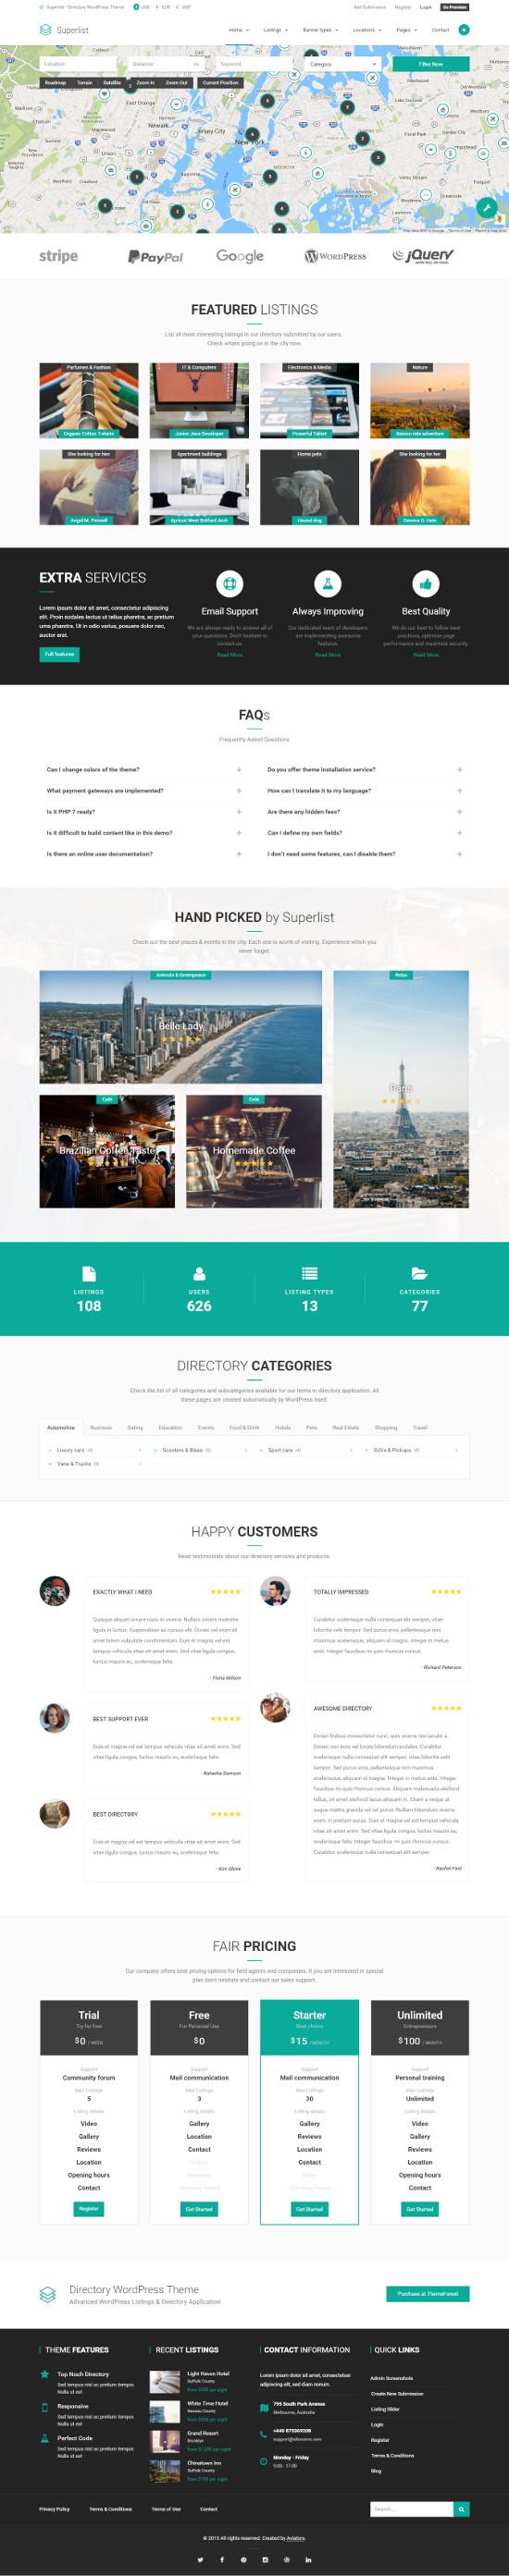 Superlist - Directory WordPress Theme